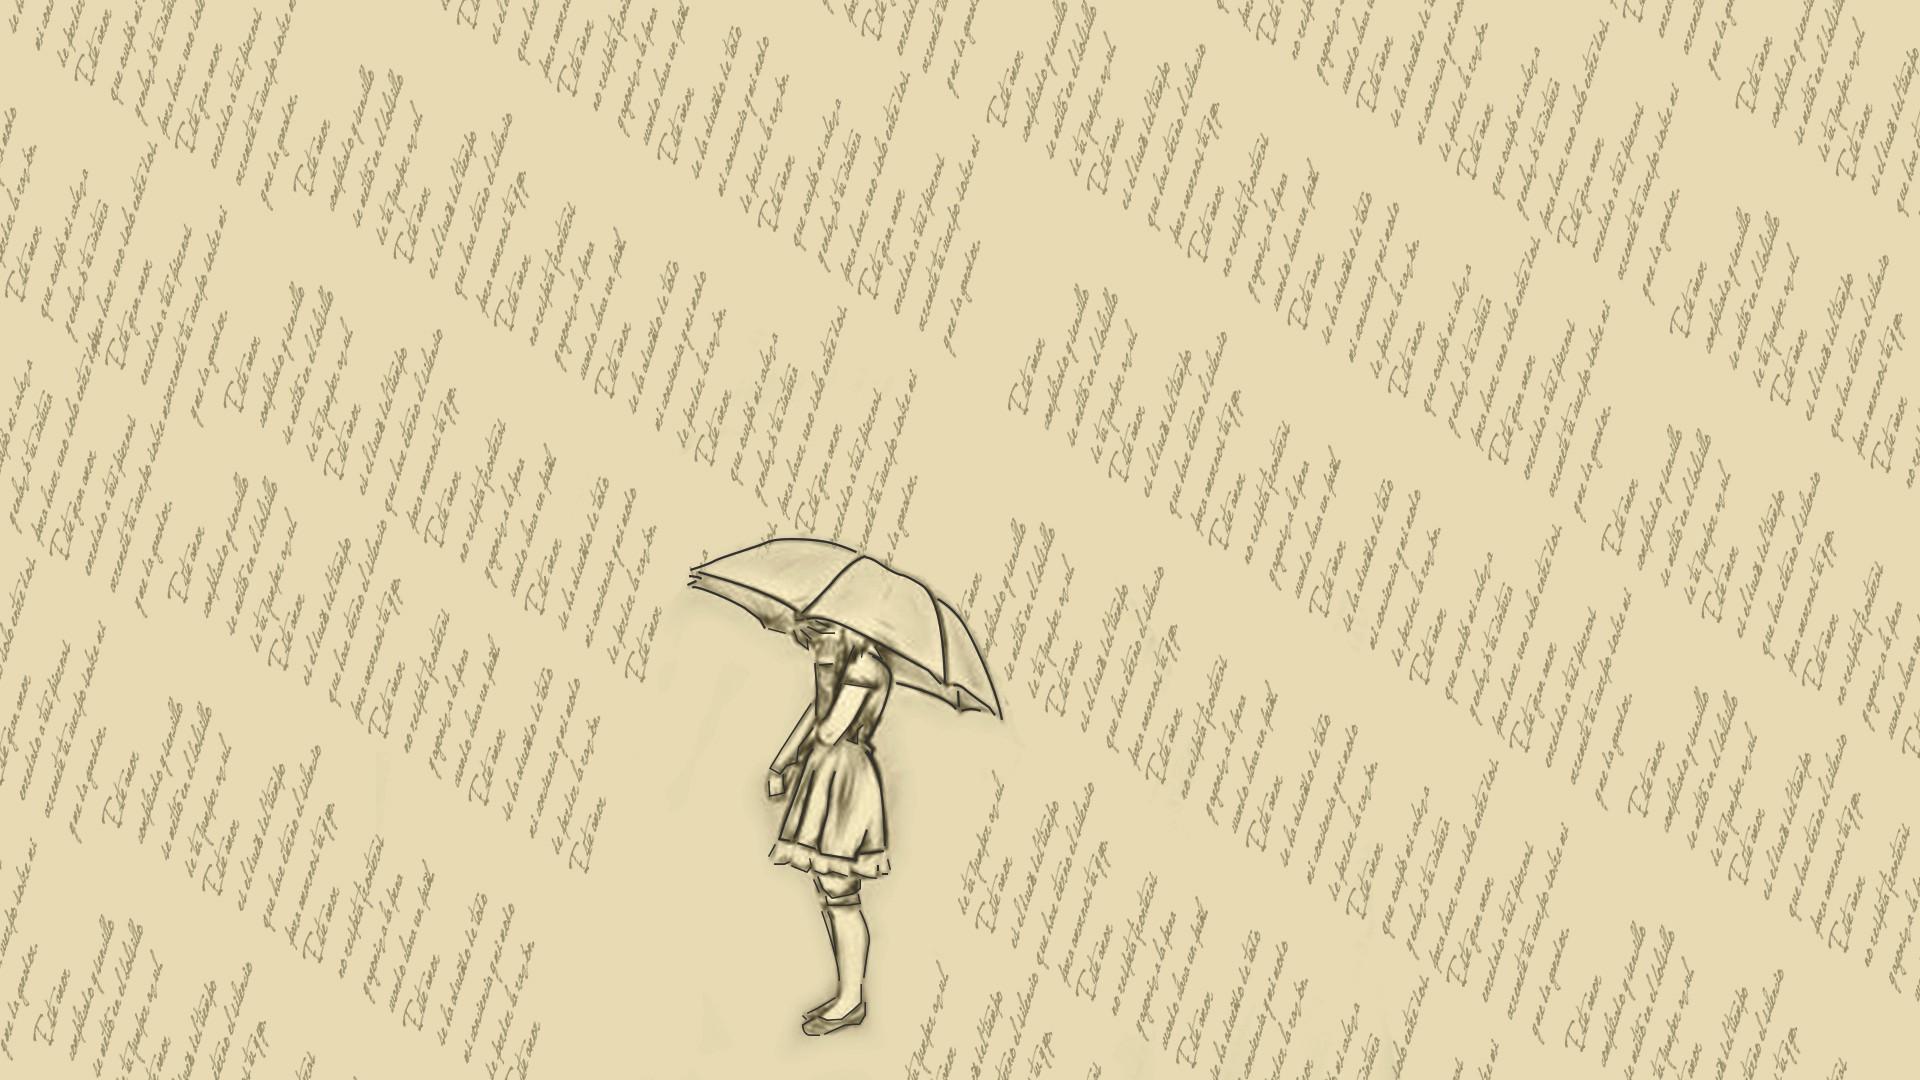 [73 ] Words Desktop Wallpaper on WallpaperSafari